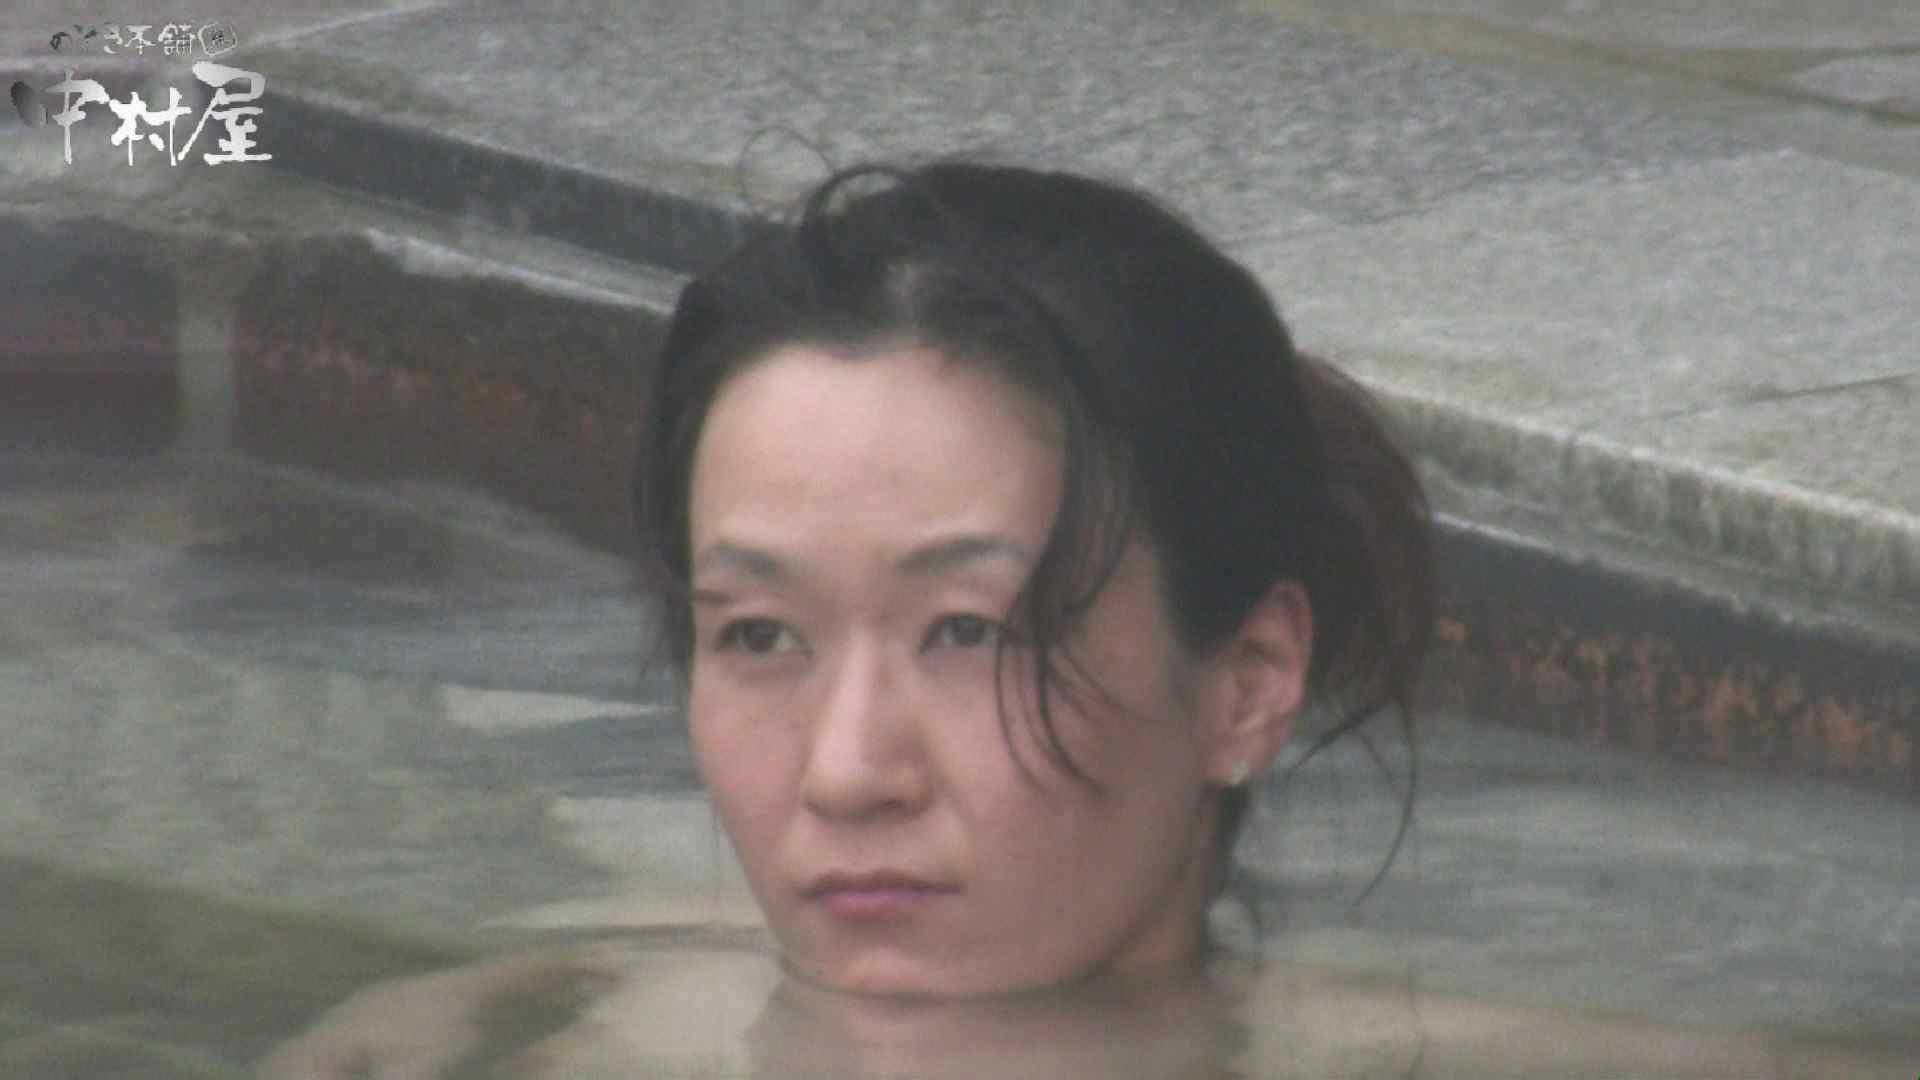 Aquaな露天風呂Vol.928 OLセックス  99画像 81